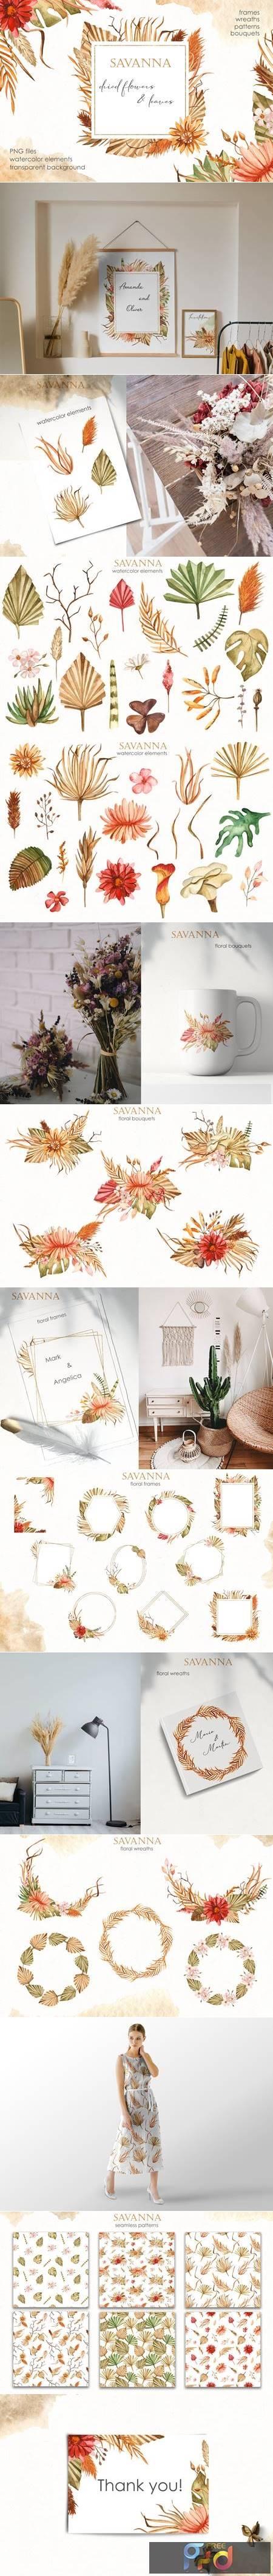 Savanna dried flowers Watercolor 4846614 1